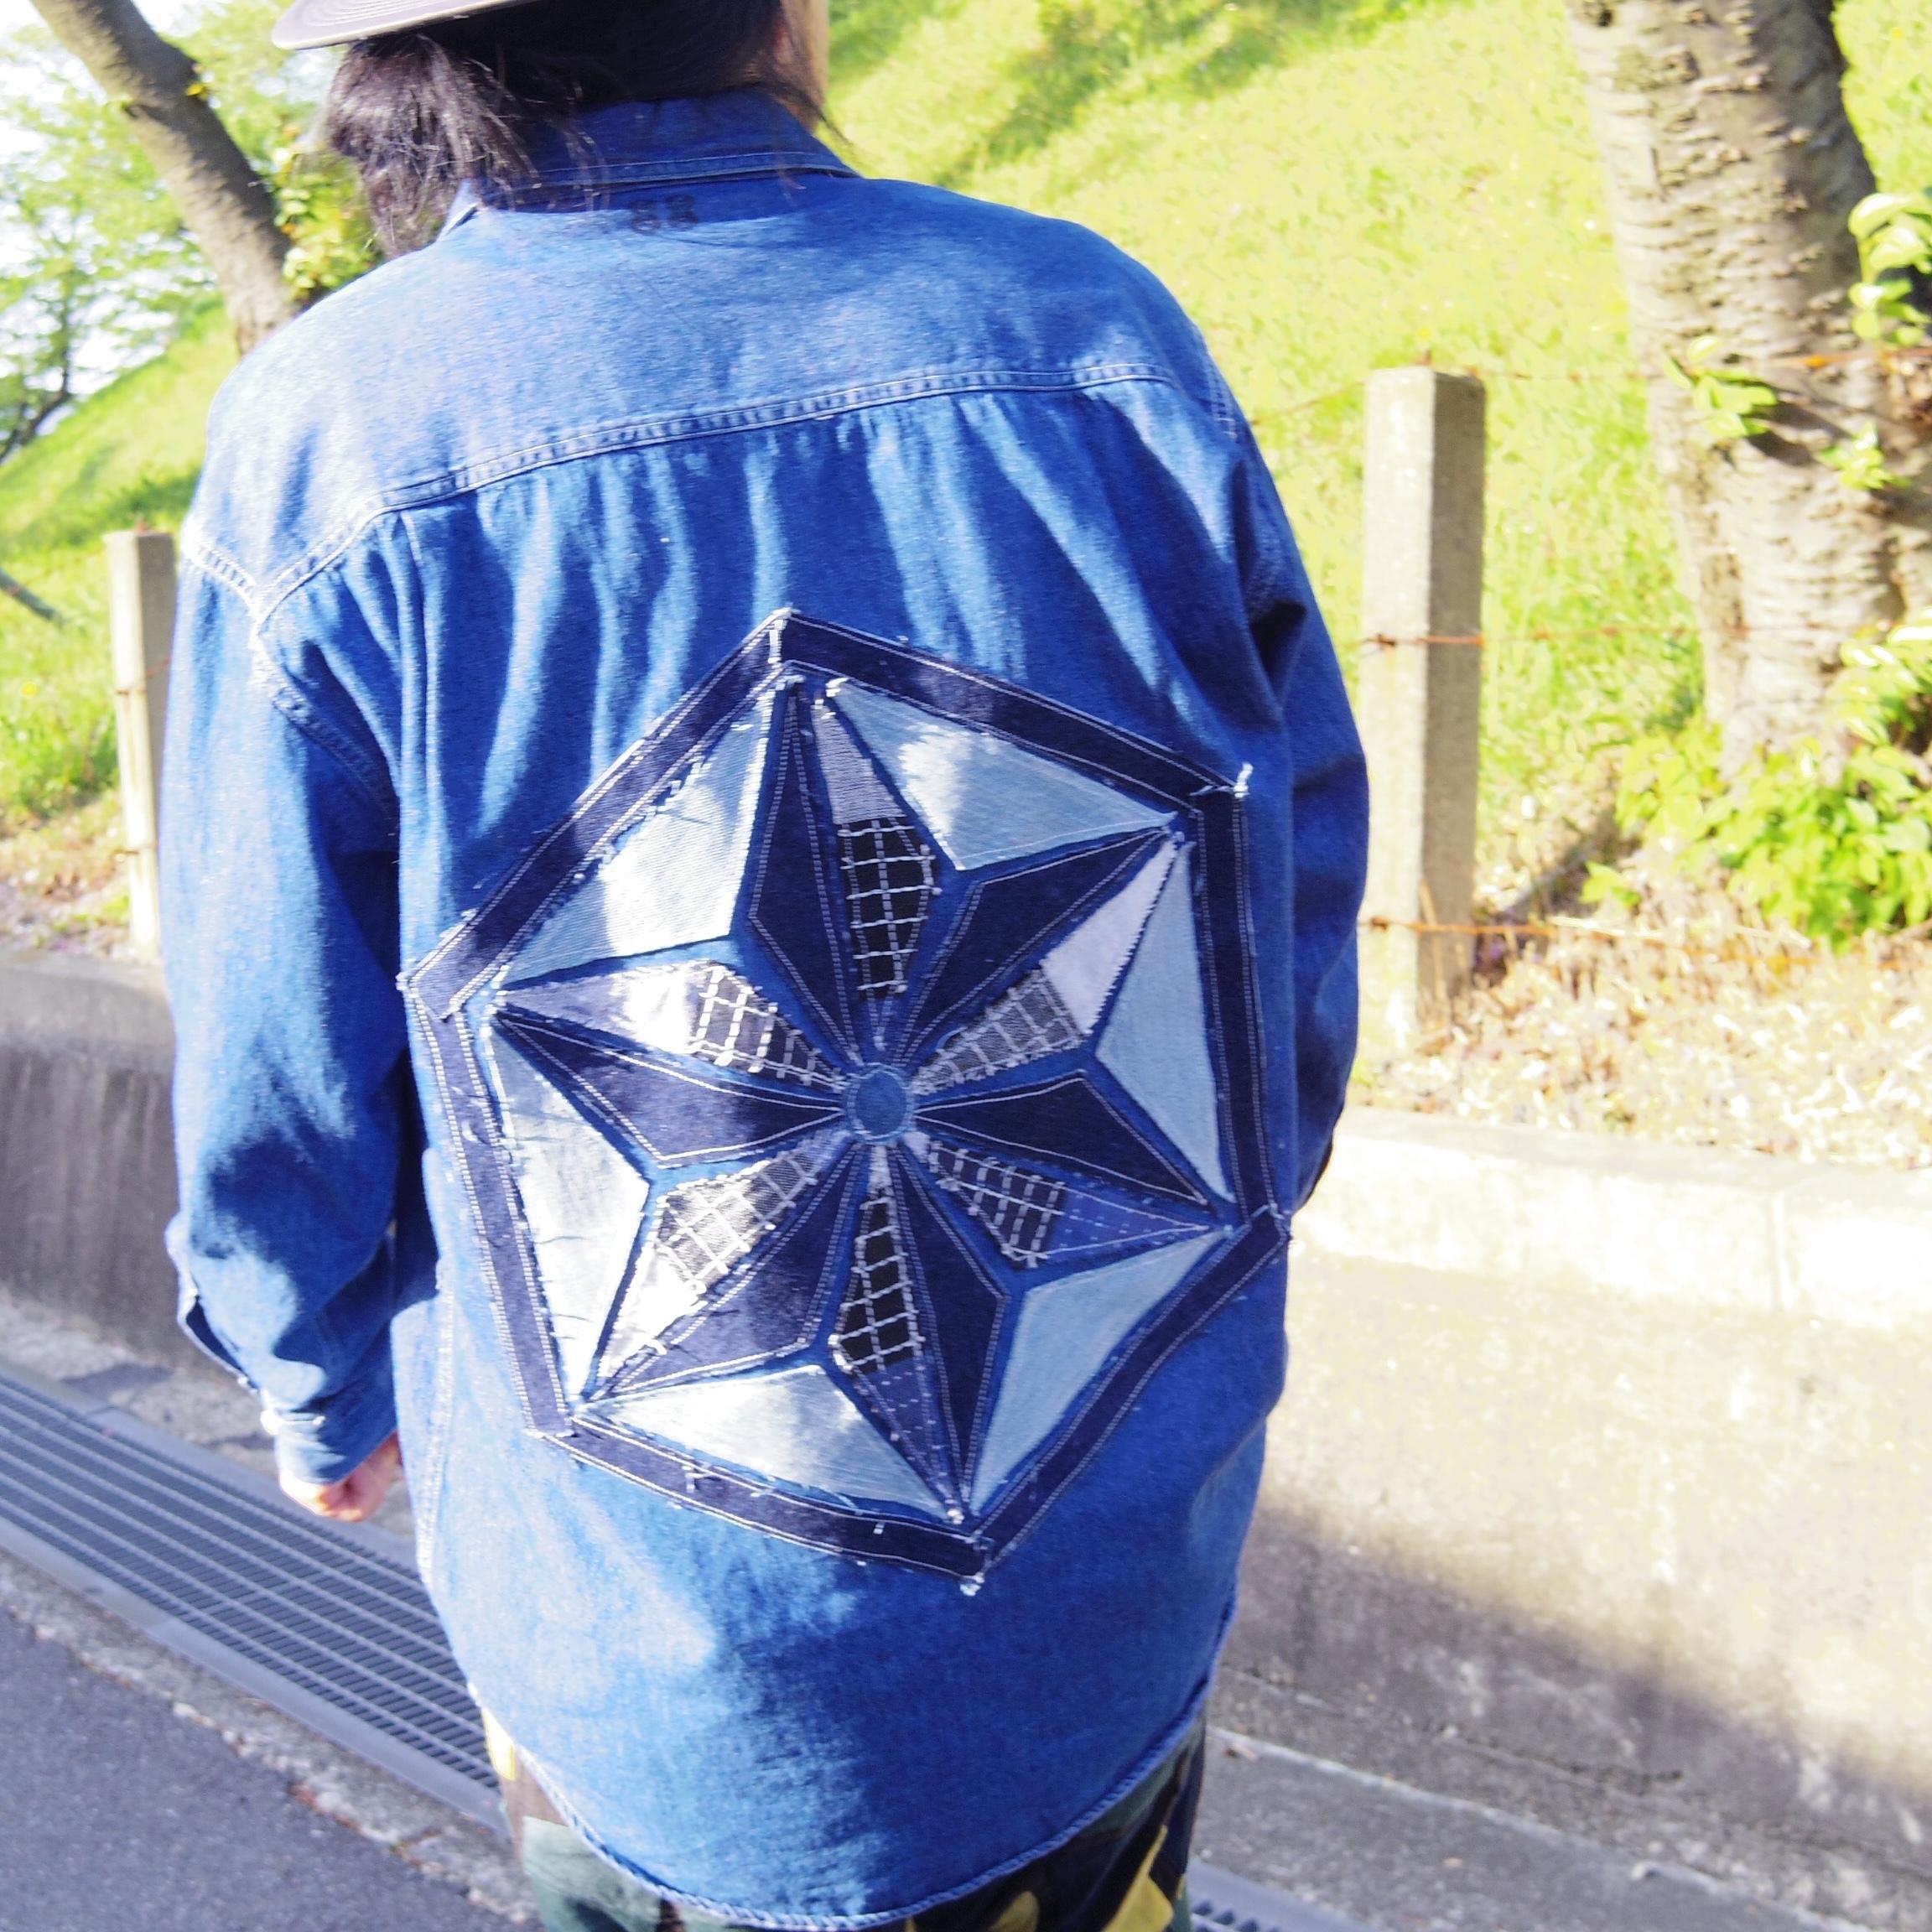 TKHOME FACTORY 麻柄 patchwork denim shirt (L)size デニムシャツ パッチワーク 麻の葉